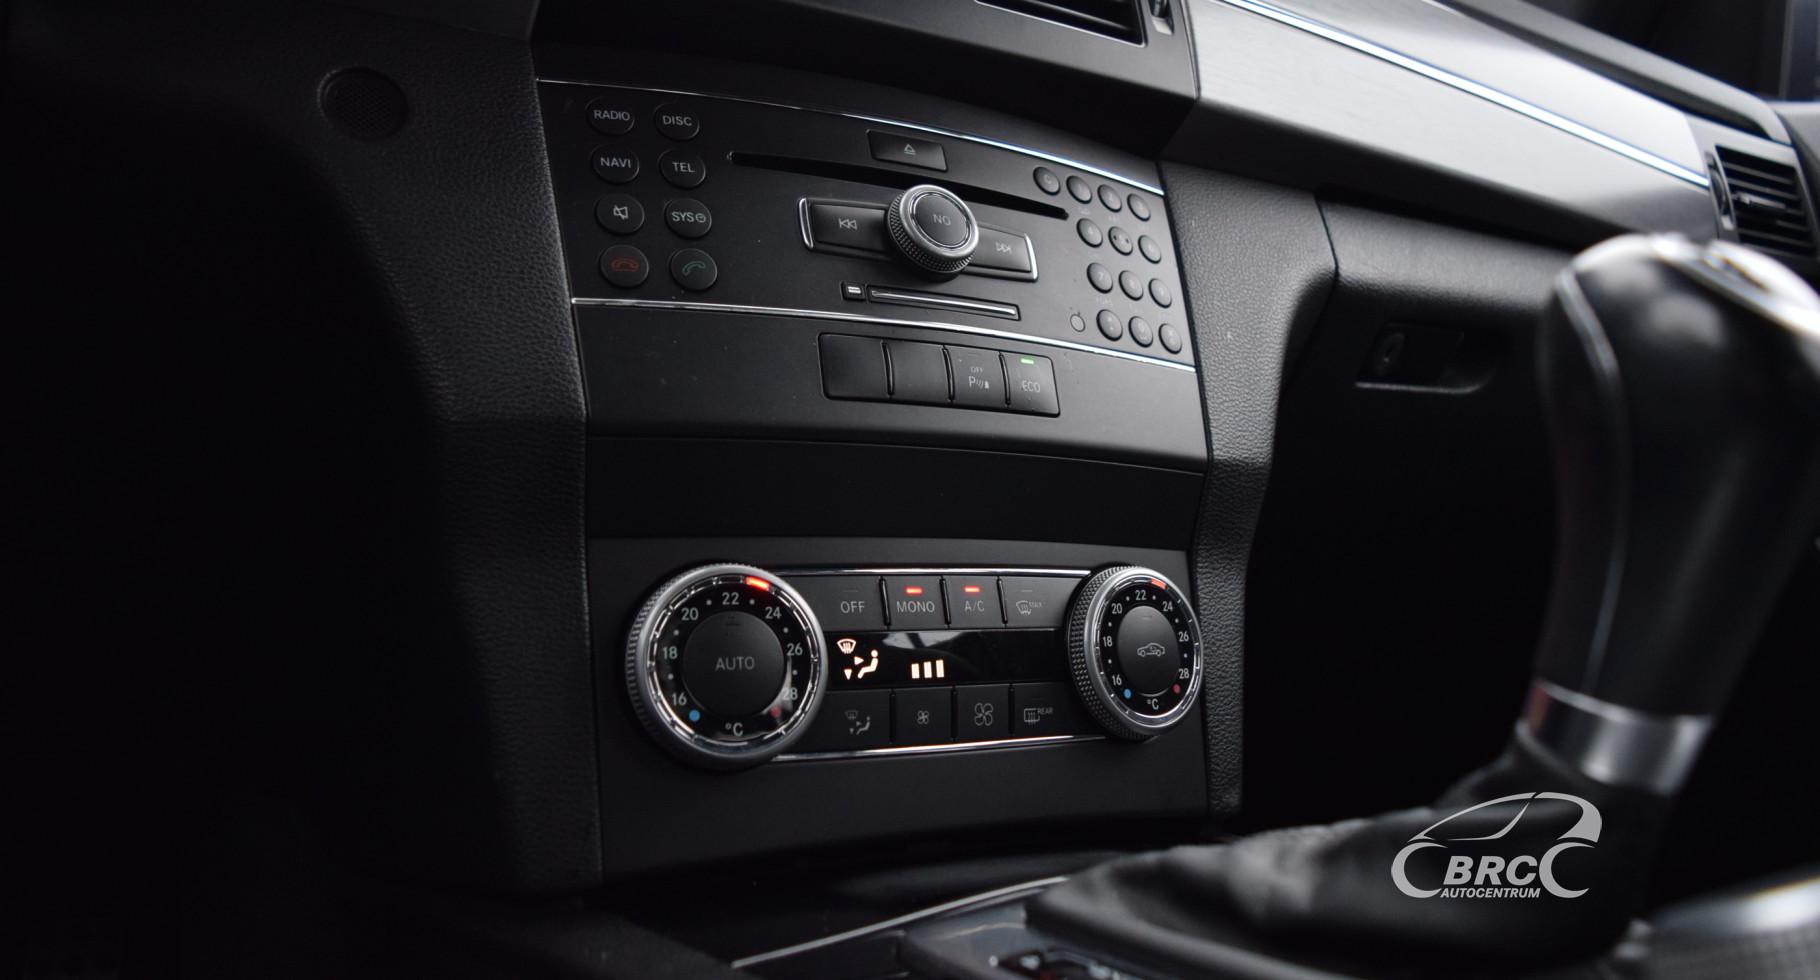 Mercedes-Benz GLK 220 BlueEfficiency